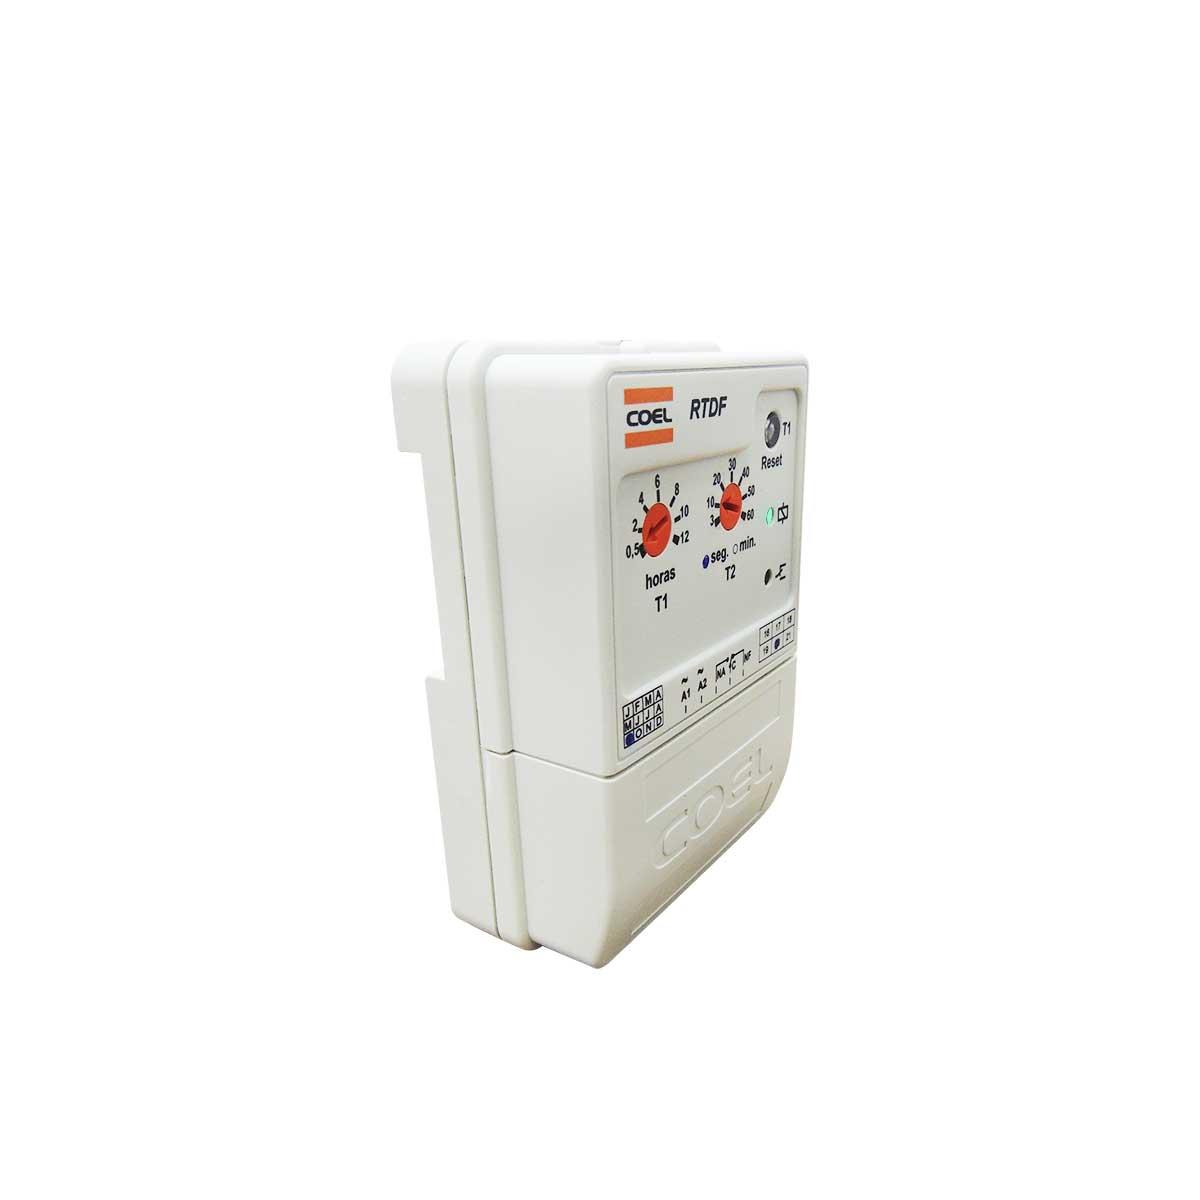 Controlador Temporizador Rele para Desgelo cíclico RTDF Coel 12H 60S 94 A 242VCA